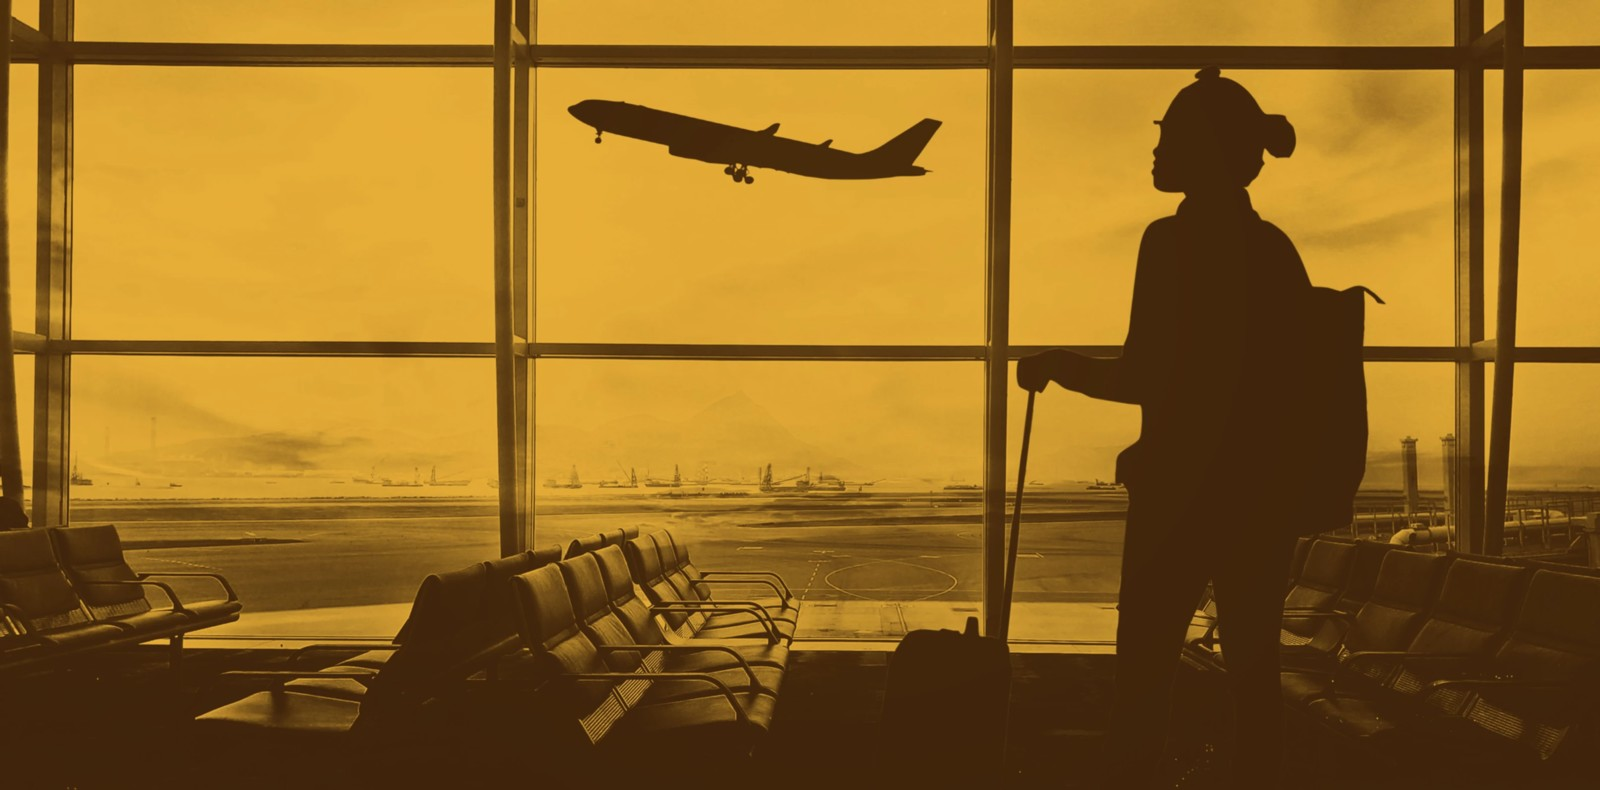 Vacay: International Travel Through Decentralized Finance